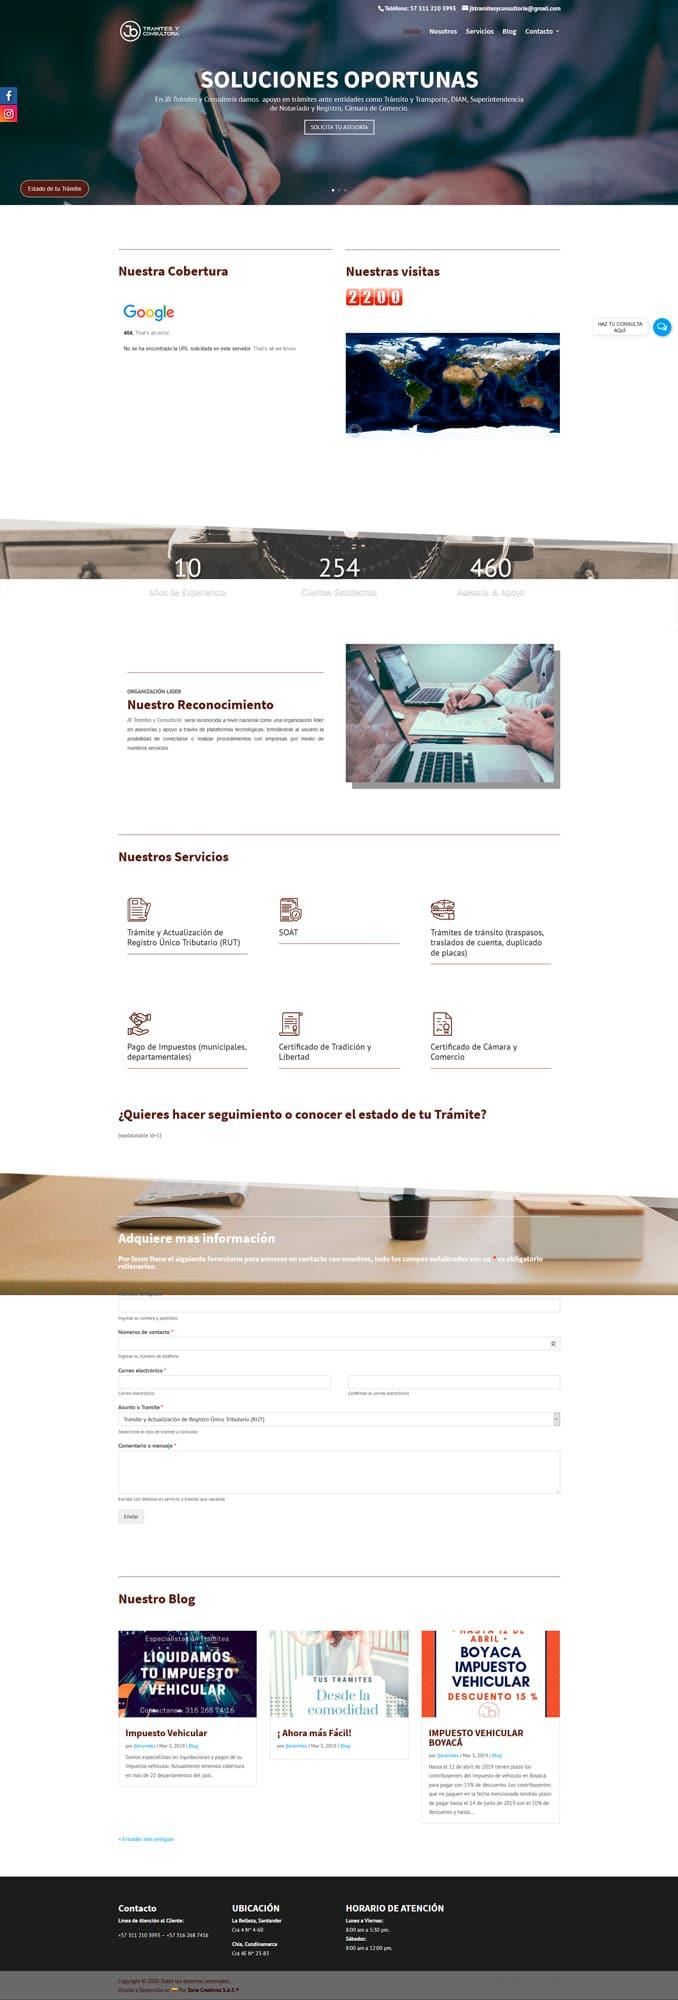 diseño web zona creativos